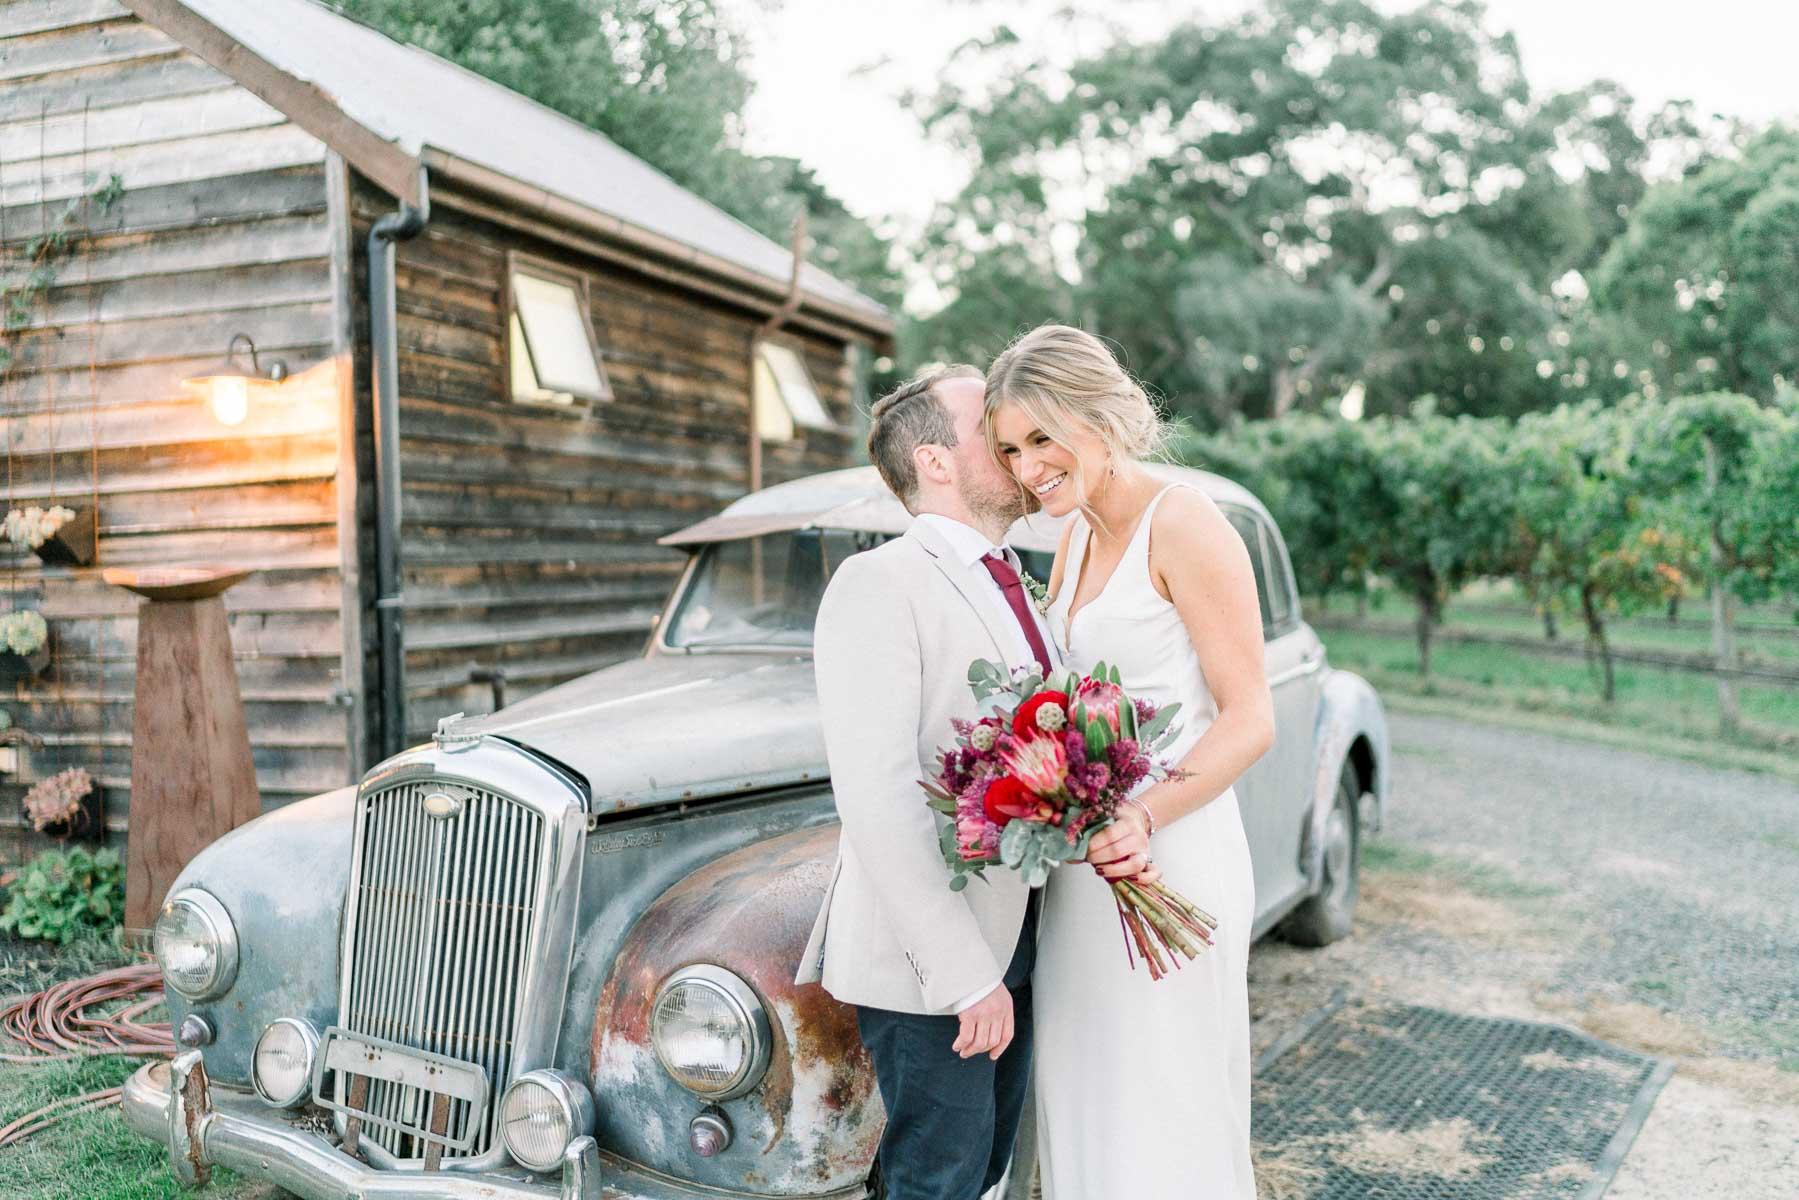 rustic-yarra-valley-wedding-venue-acacia-ridge-georgia-james-08457.jpg